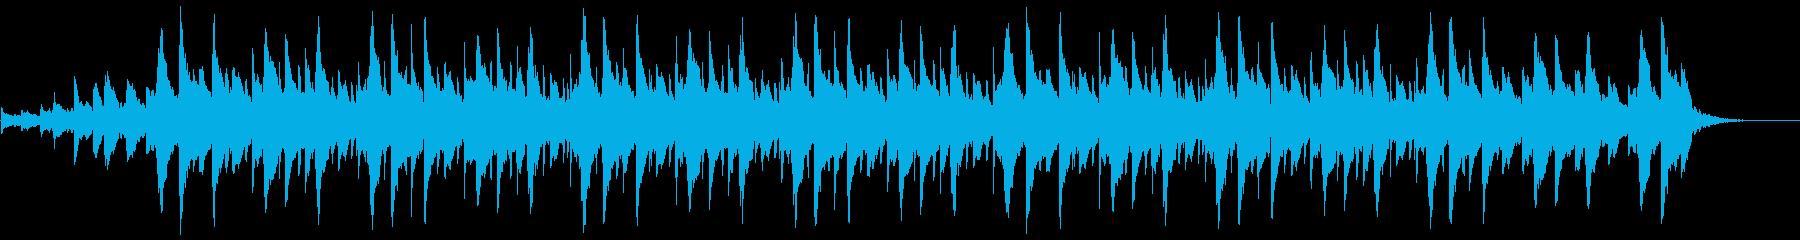 【LOFI HIPHOP】深夜勉強用Aの再生済みの波形